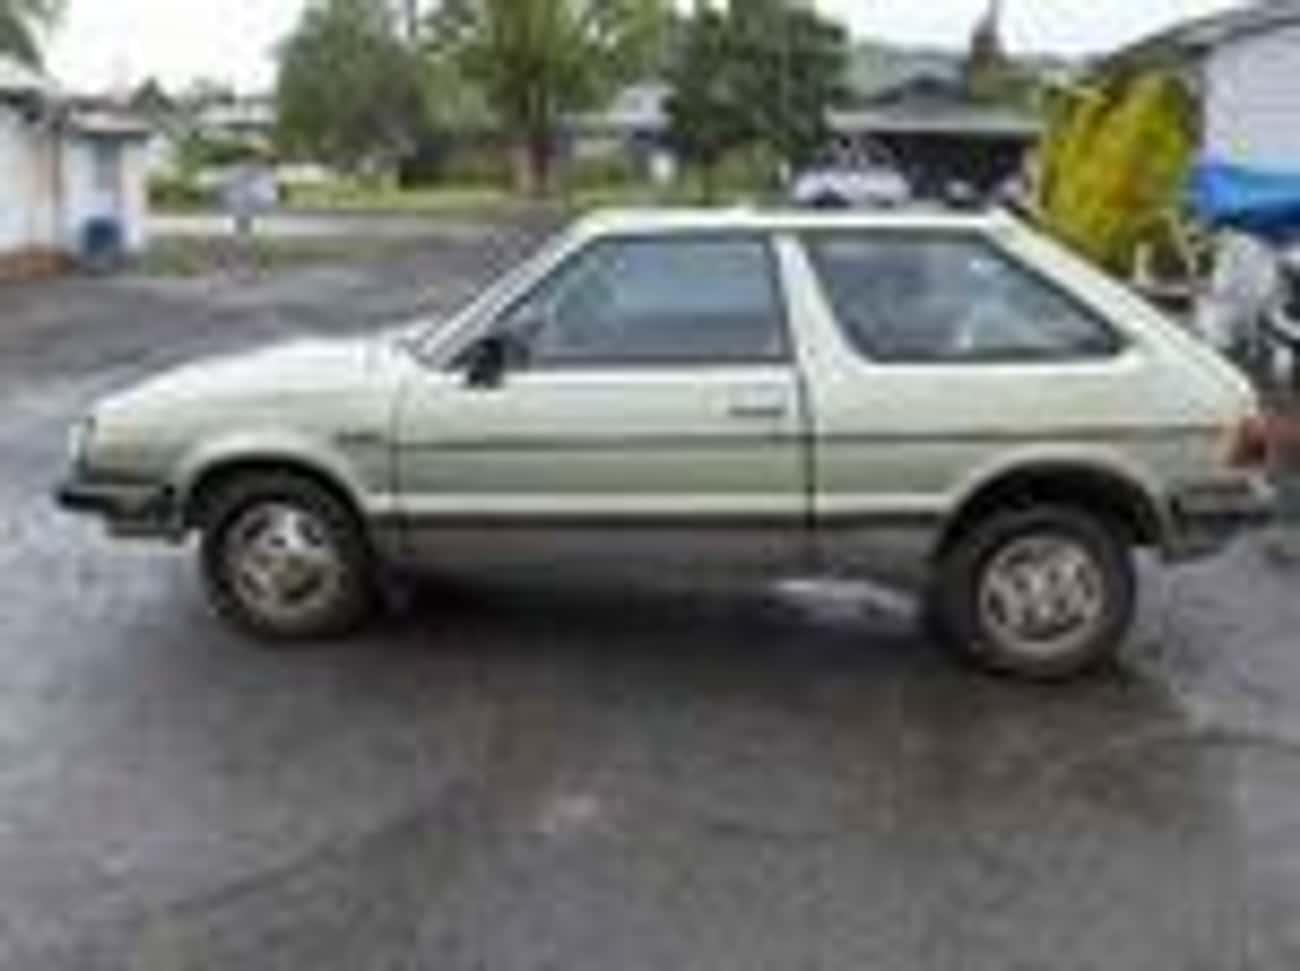 1985 Subaru Hatchback Hatchbac is listed (or ranked) 2 on the list List of 1985 Subarus